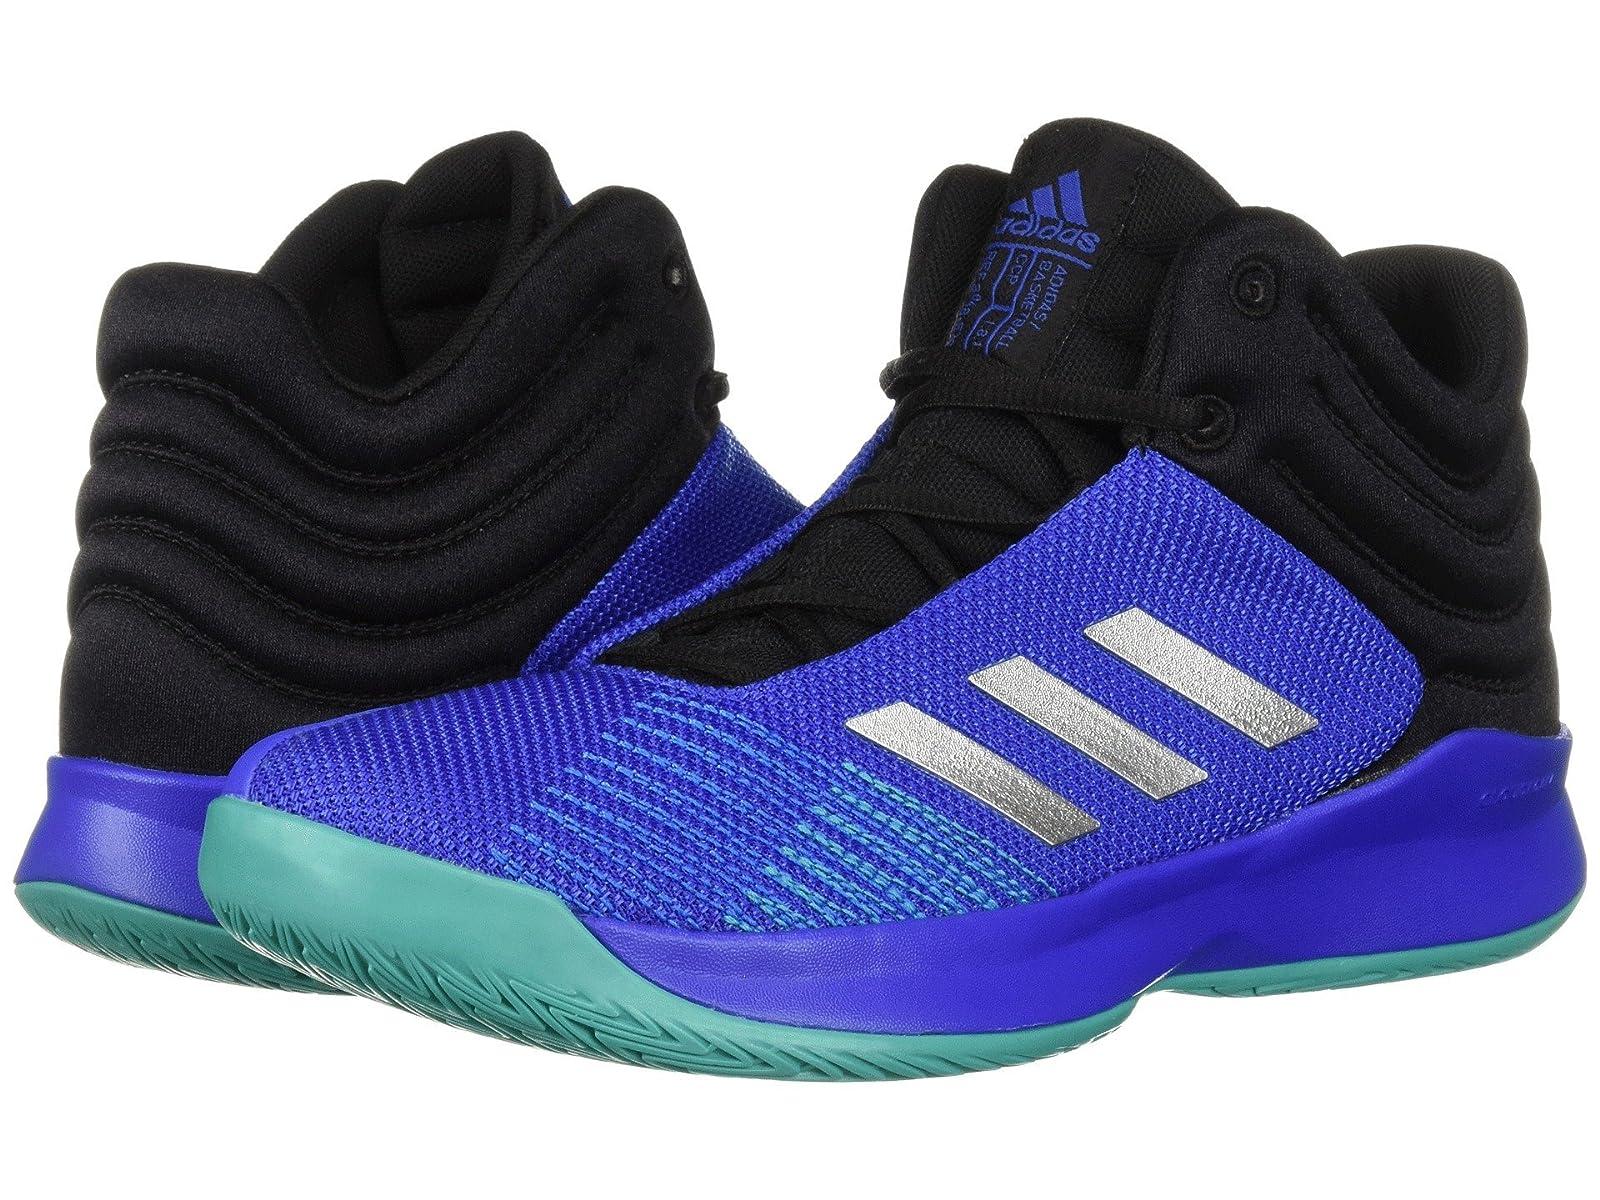 adidas Kids Pro Spark Basketball Wide (Little Kid/Big Kid)Atmospheric grades have affordable shoes